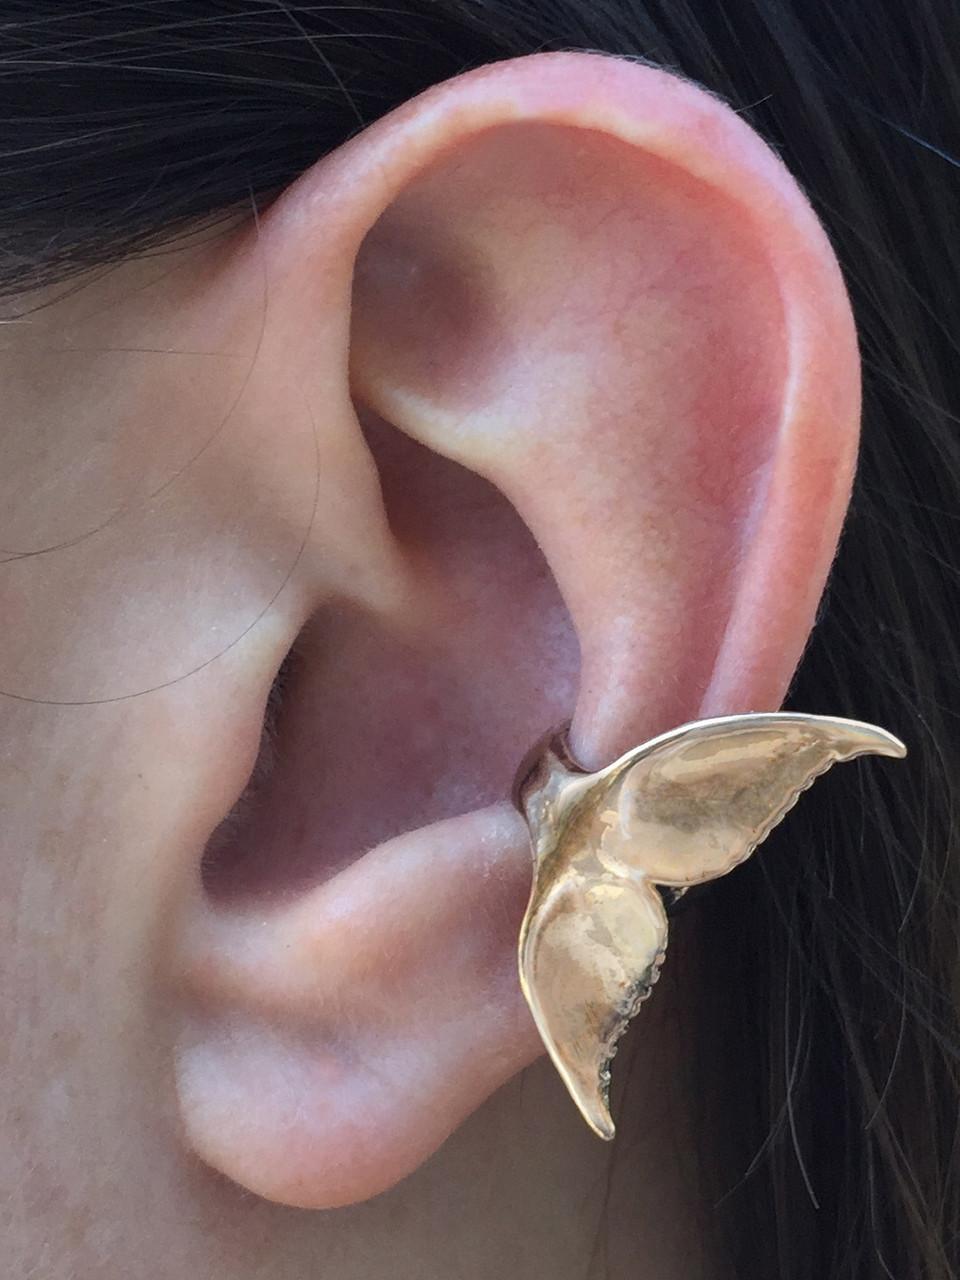 de6a1e27d Whale Tail Ear Cuff - Bronze - Marty Magic Store